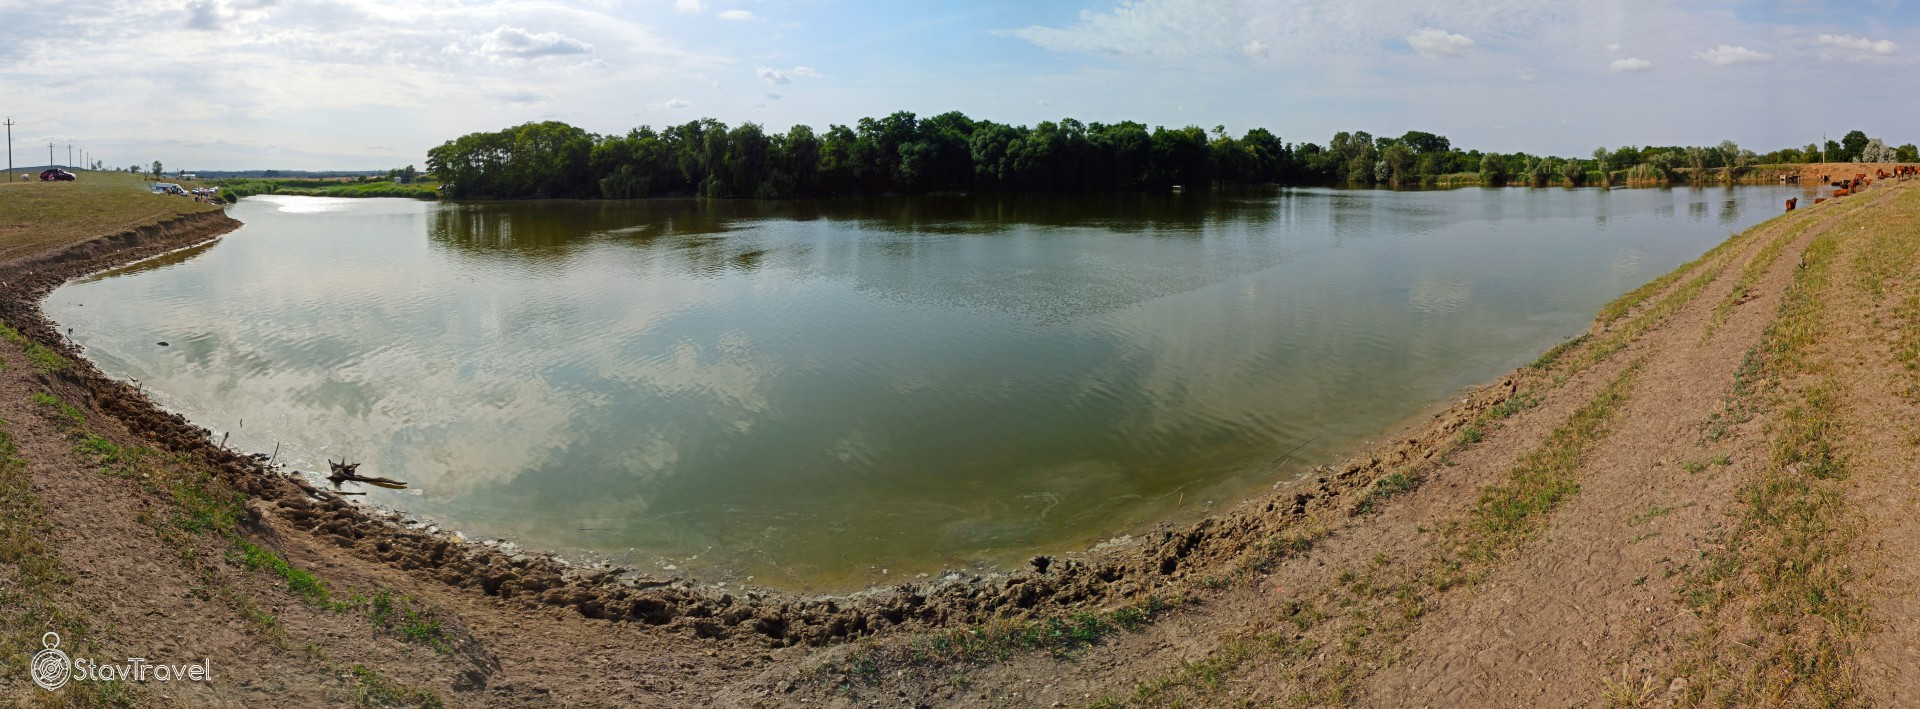 Кизиловы пруды